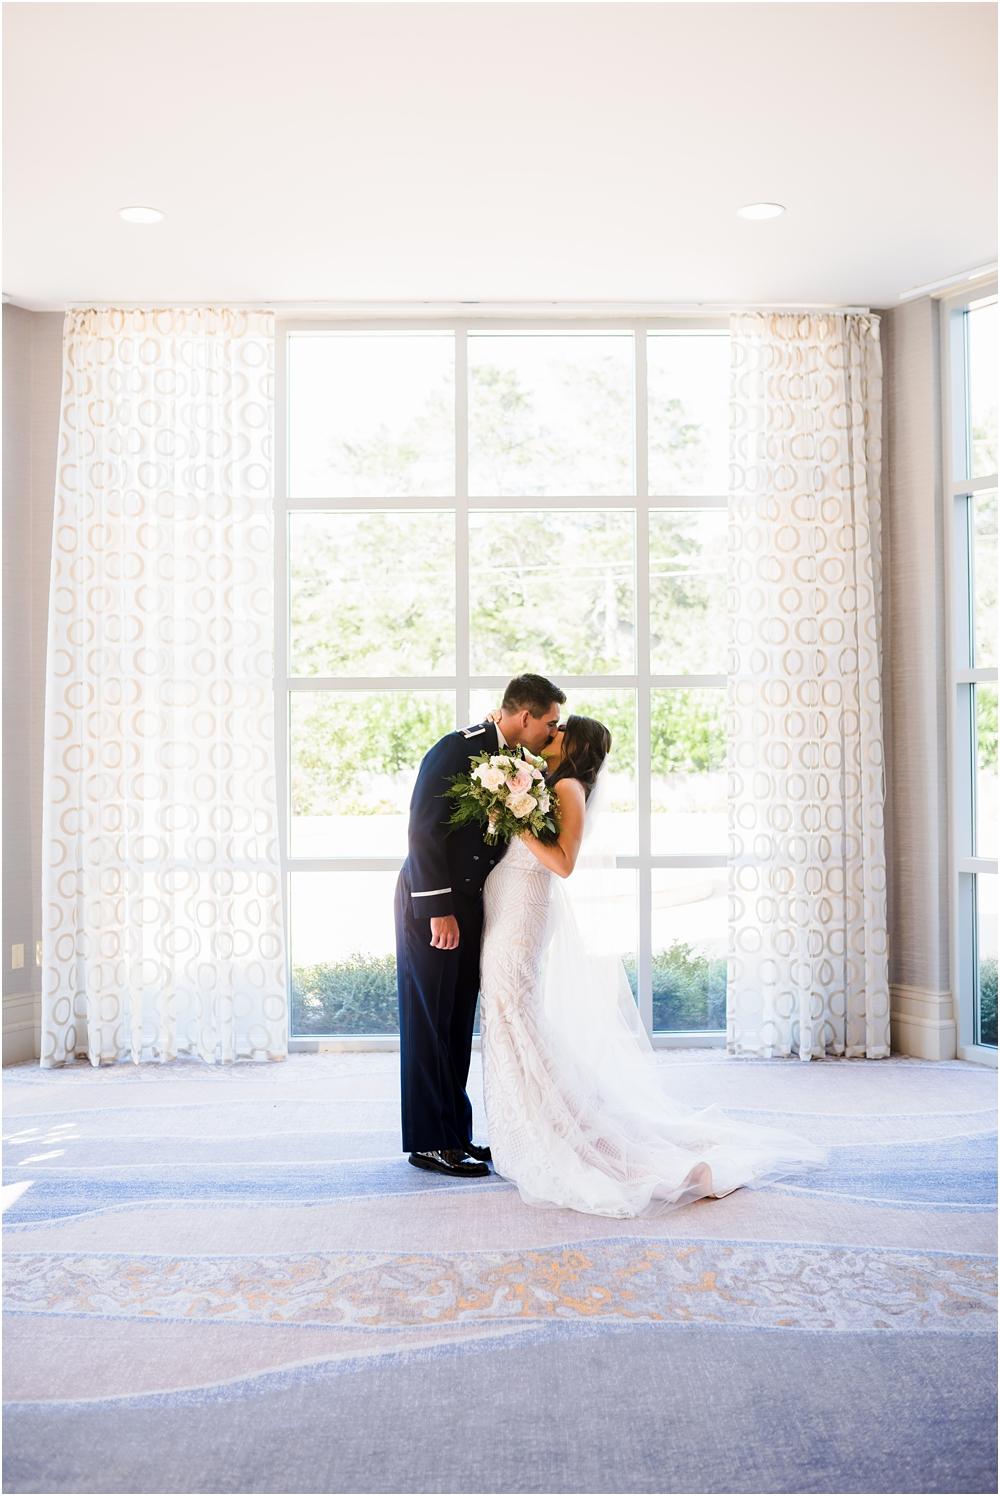 amack-wedding-kiersten-stevenson-photography-30a-panama-city-beach-dothan-tallahassee-(142-of-882).JPG